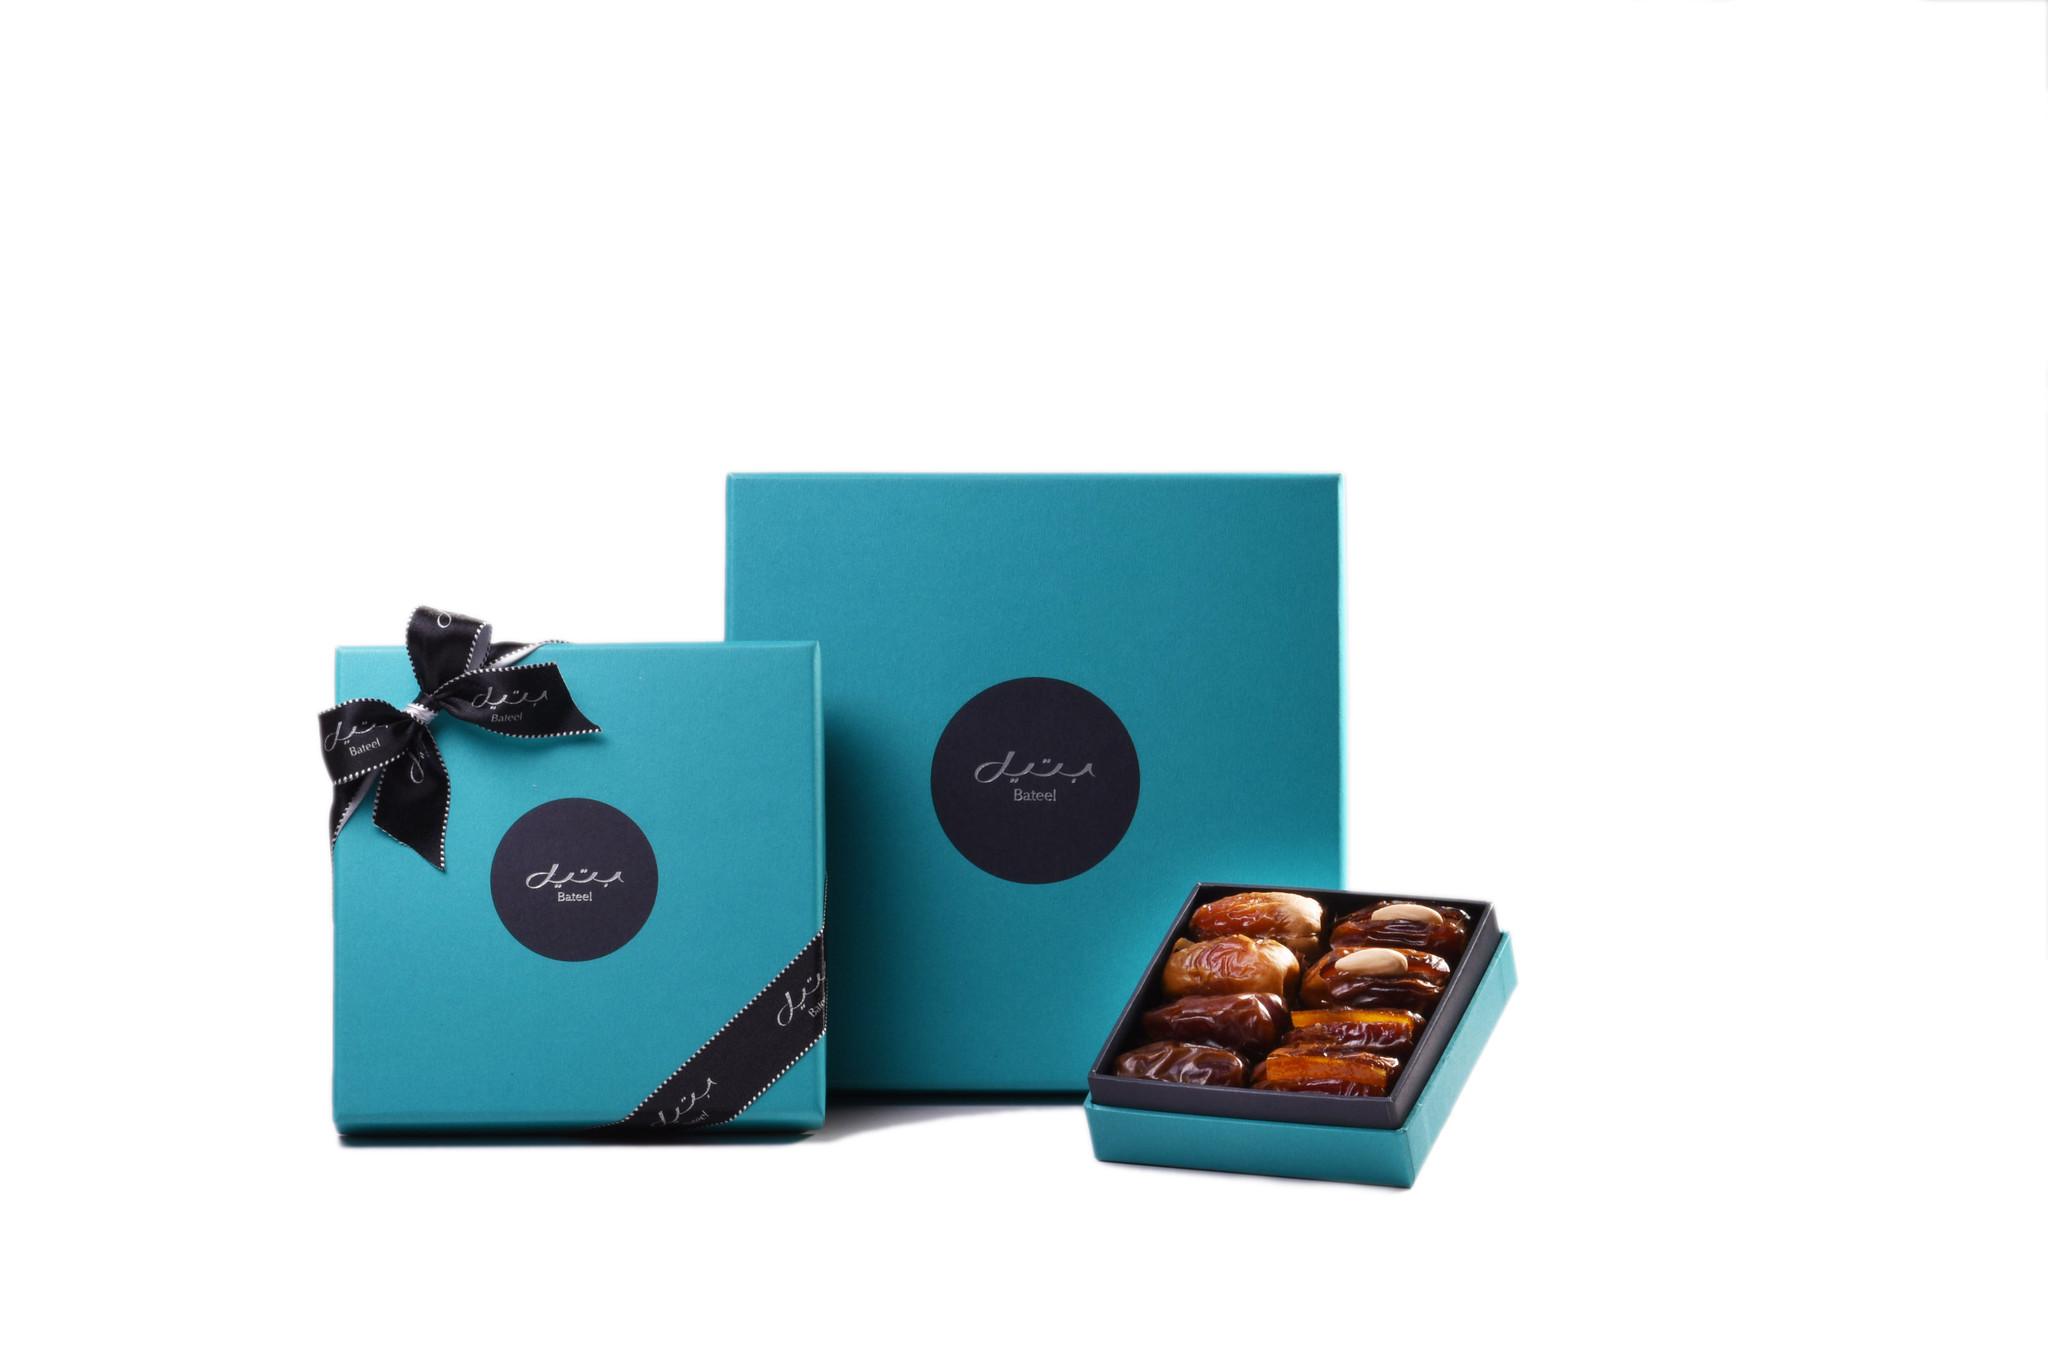 Bateel USA Spring Box Turquoise